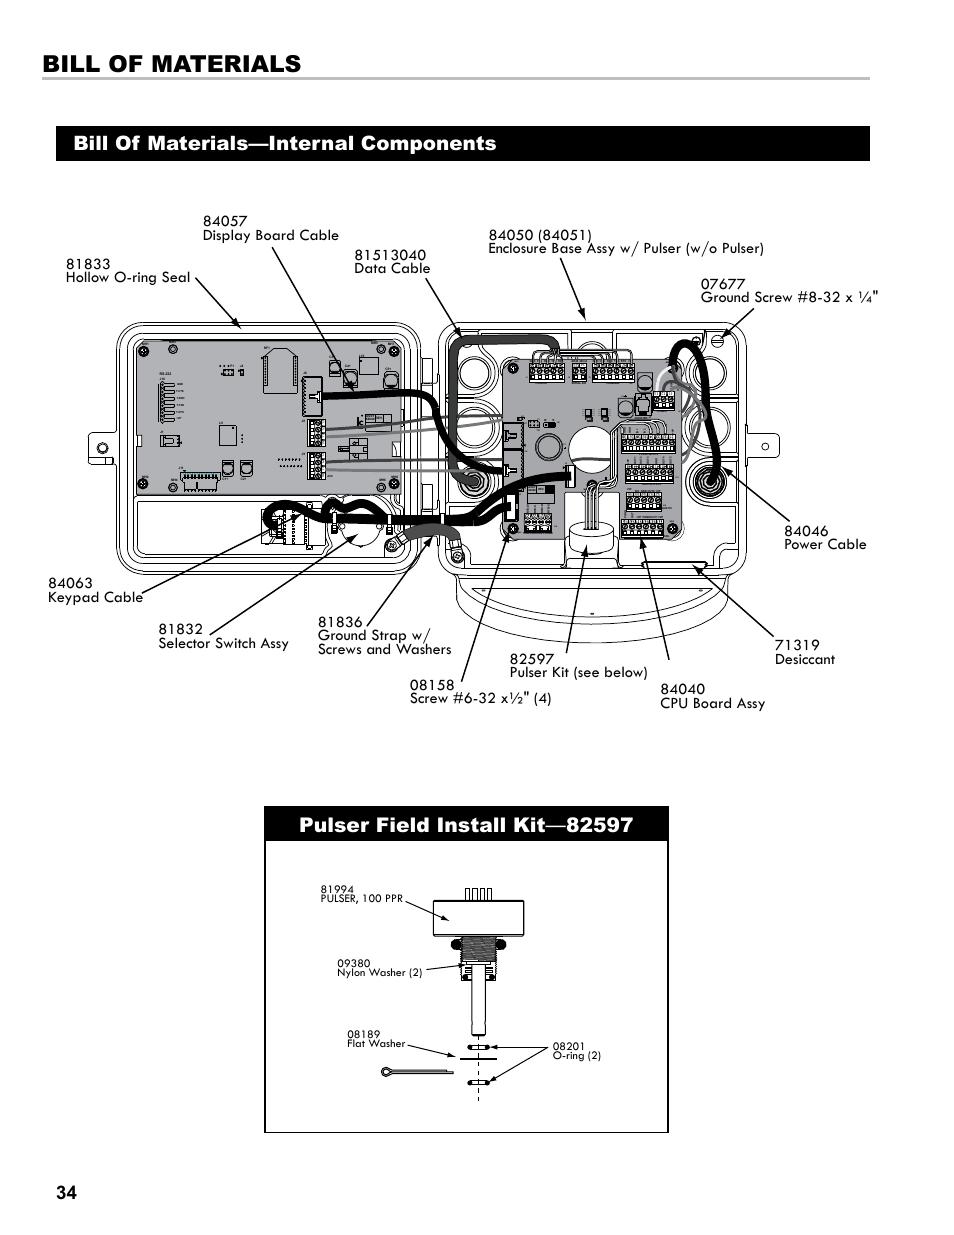 Bill of materials, Bill of materials—internal components